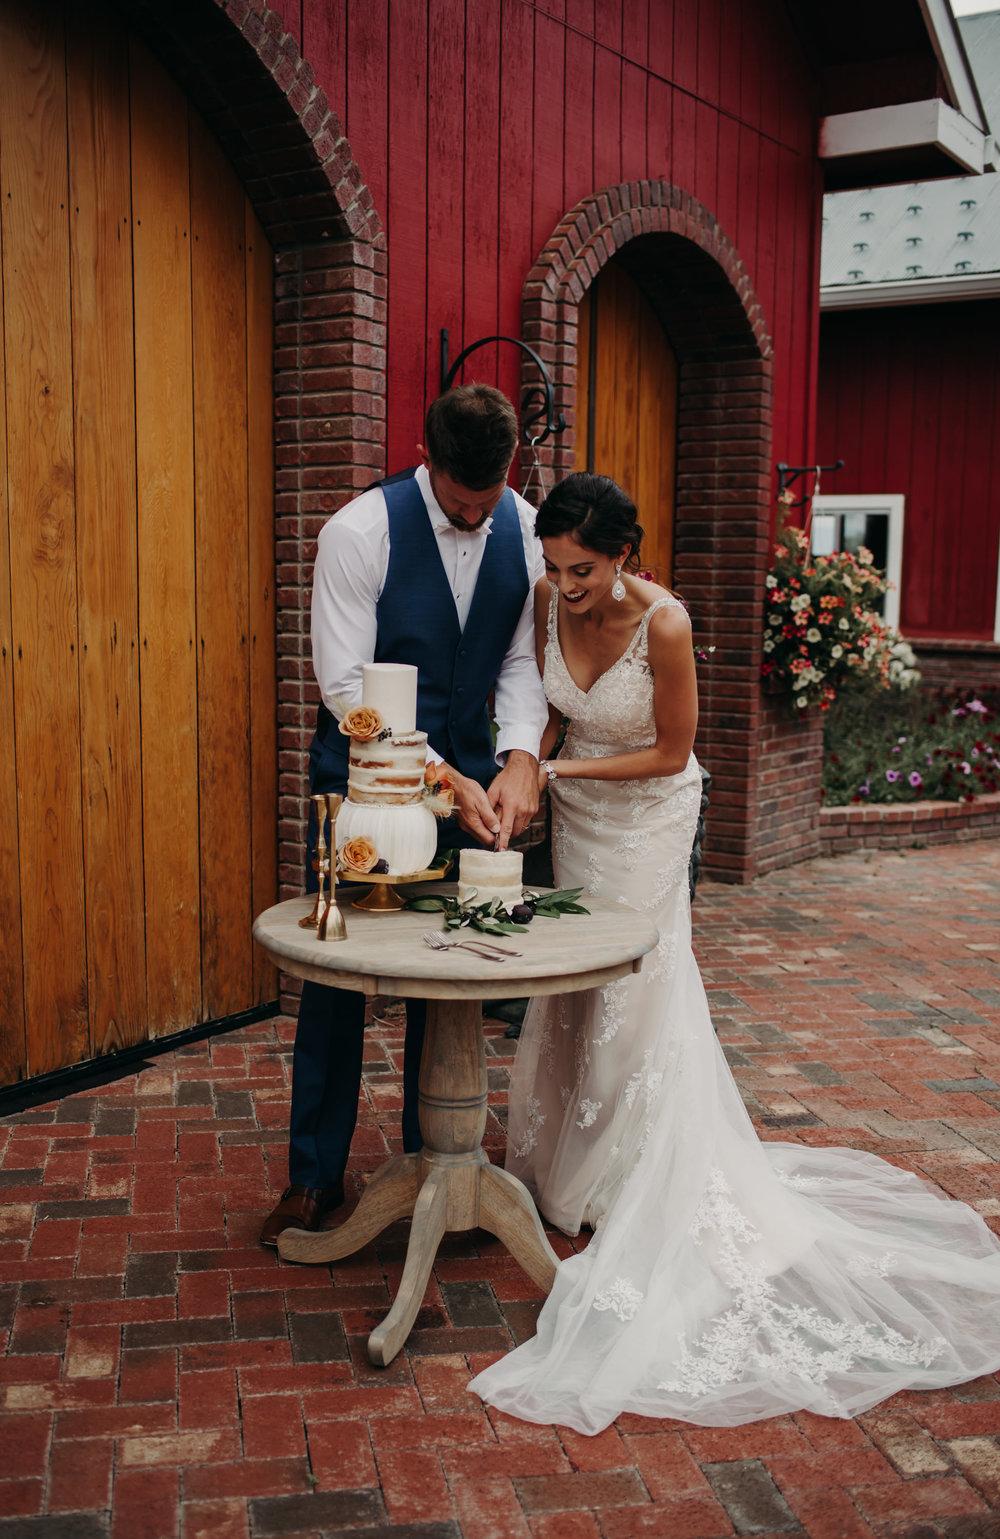 MZP.WeddingPhotography.CrookedWillowFarms-61.jpg